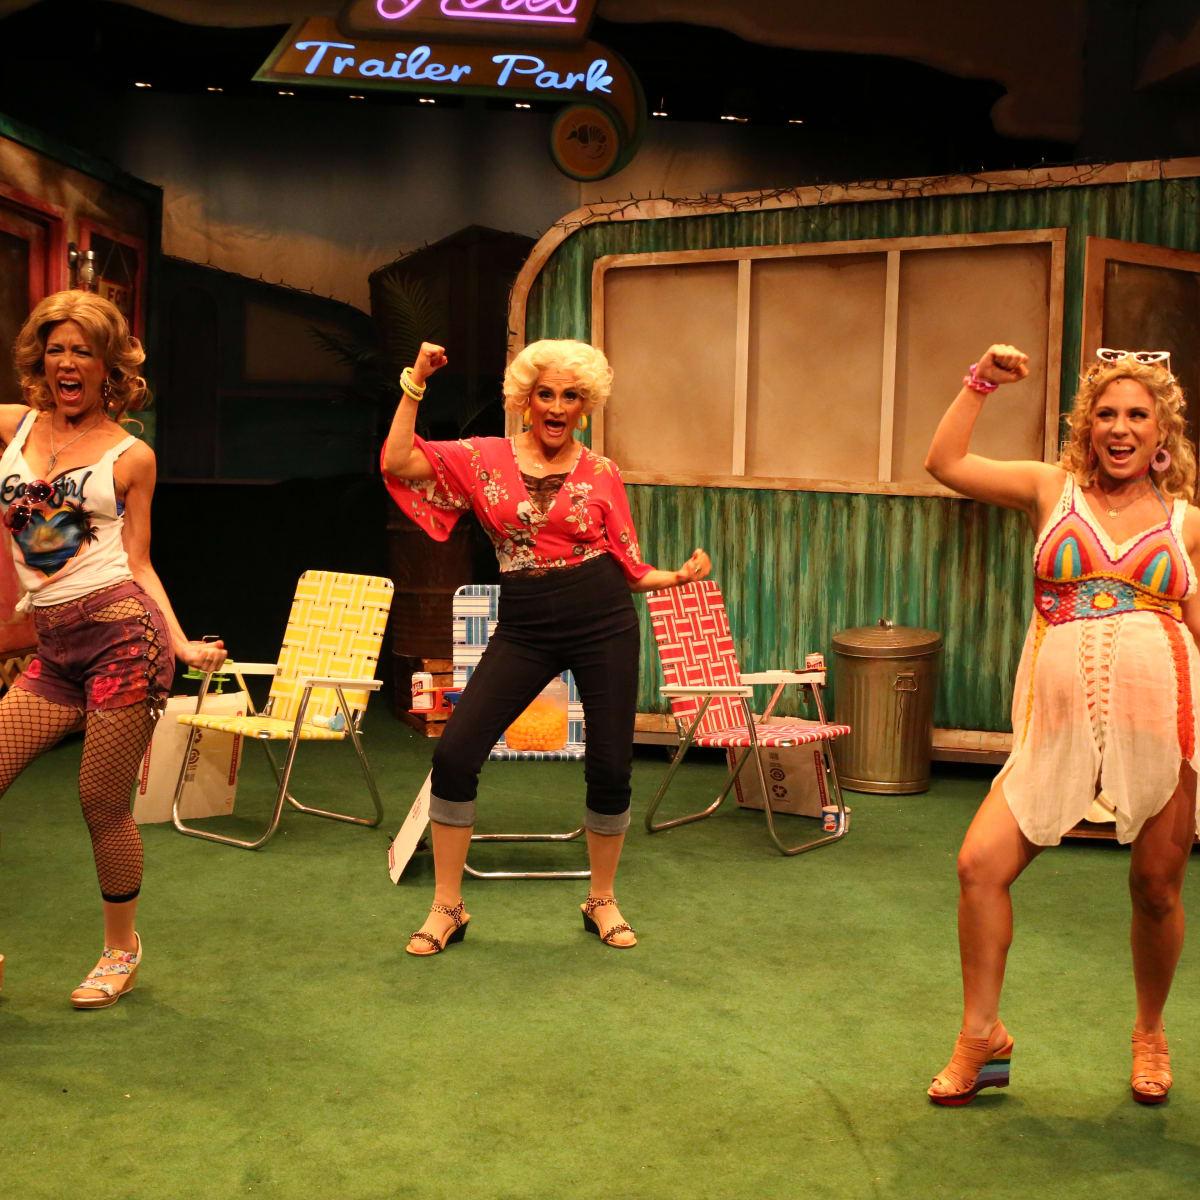 Stages Theatre: Trailer Park, Carolyn Johnson, Susan Koozin and Teresa Zimmermann